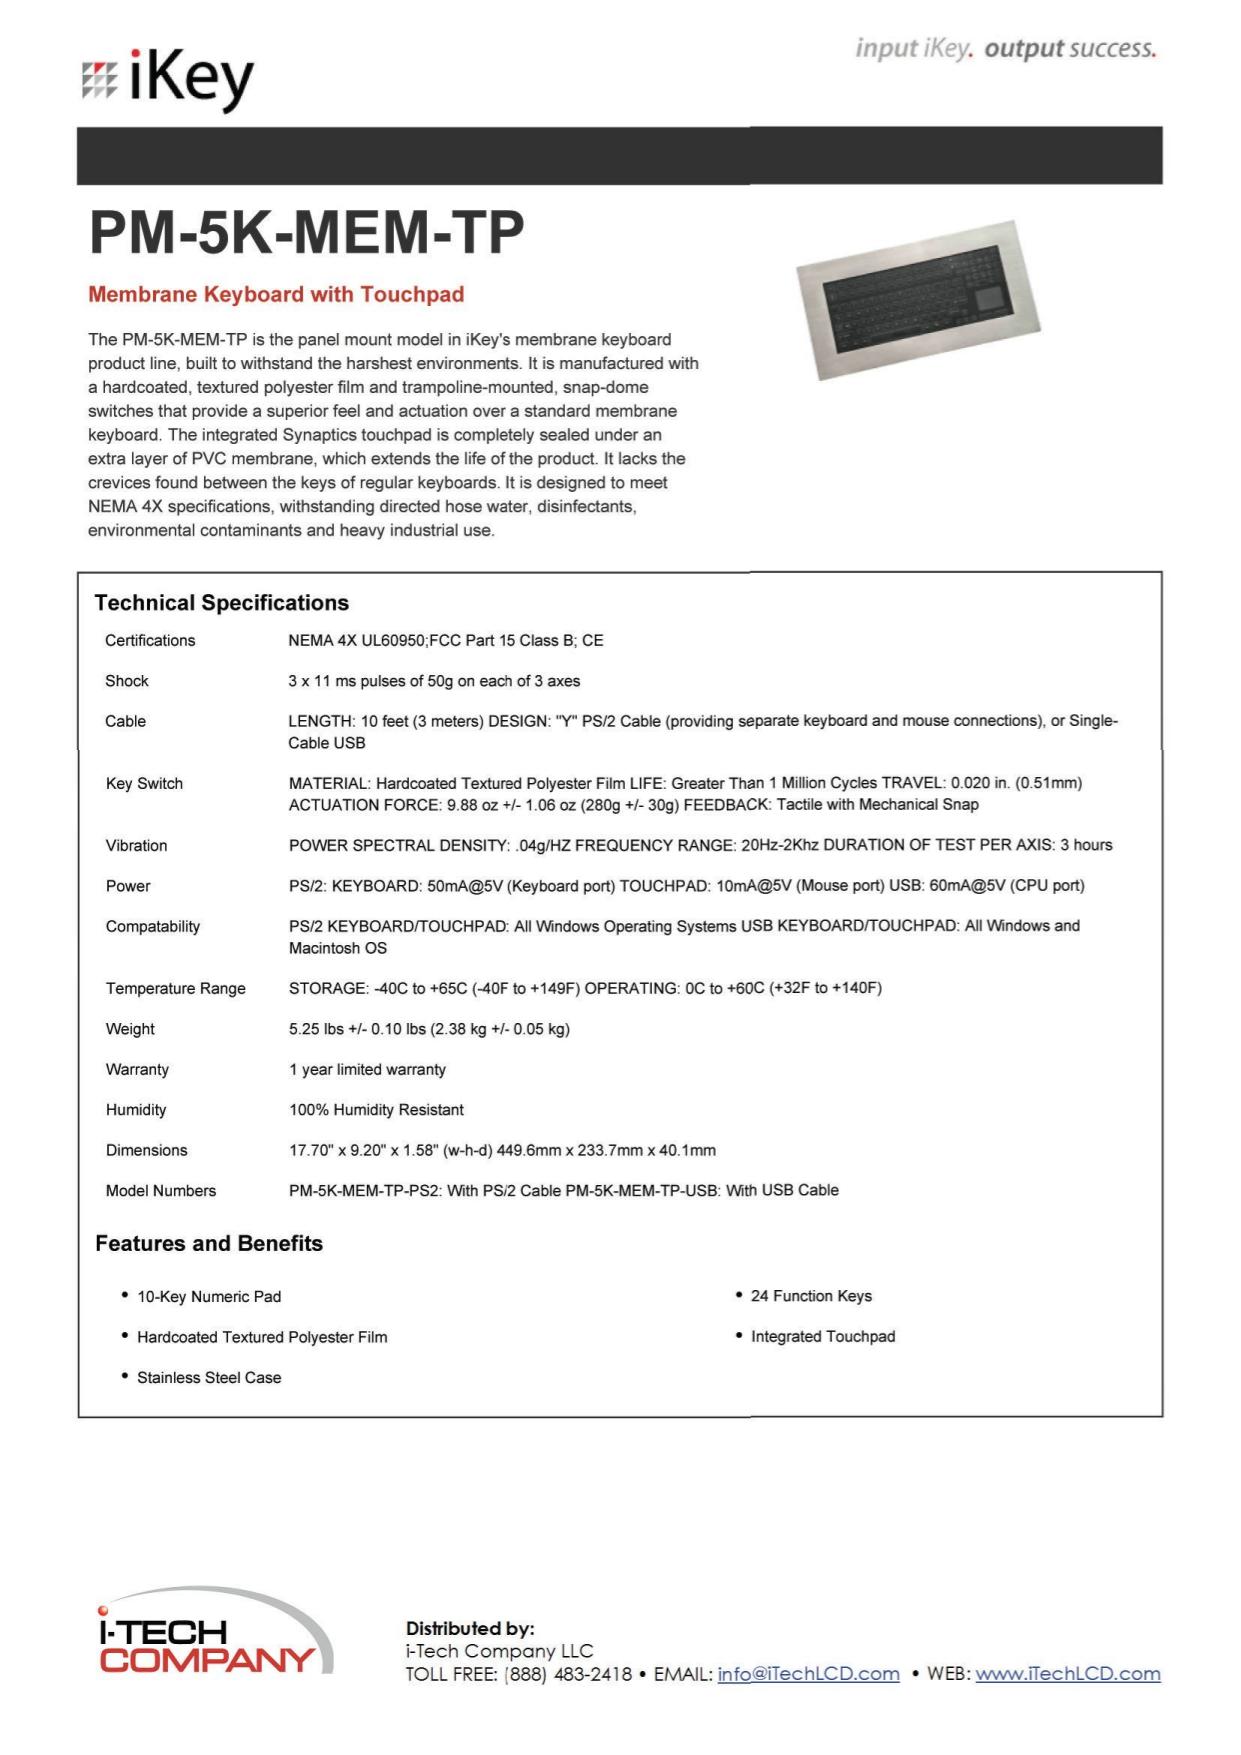 pdf for iKey Keyboard PM-5K manual